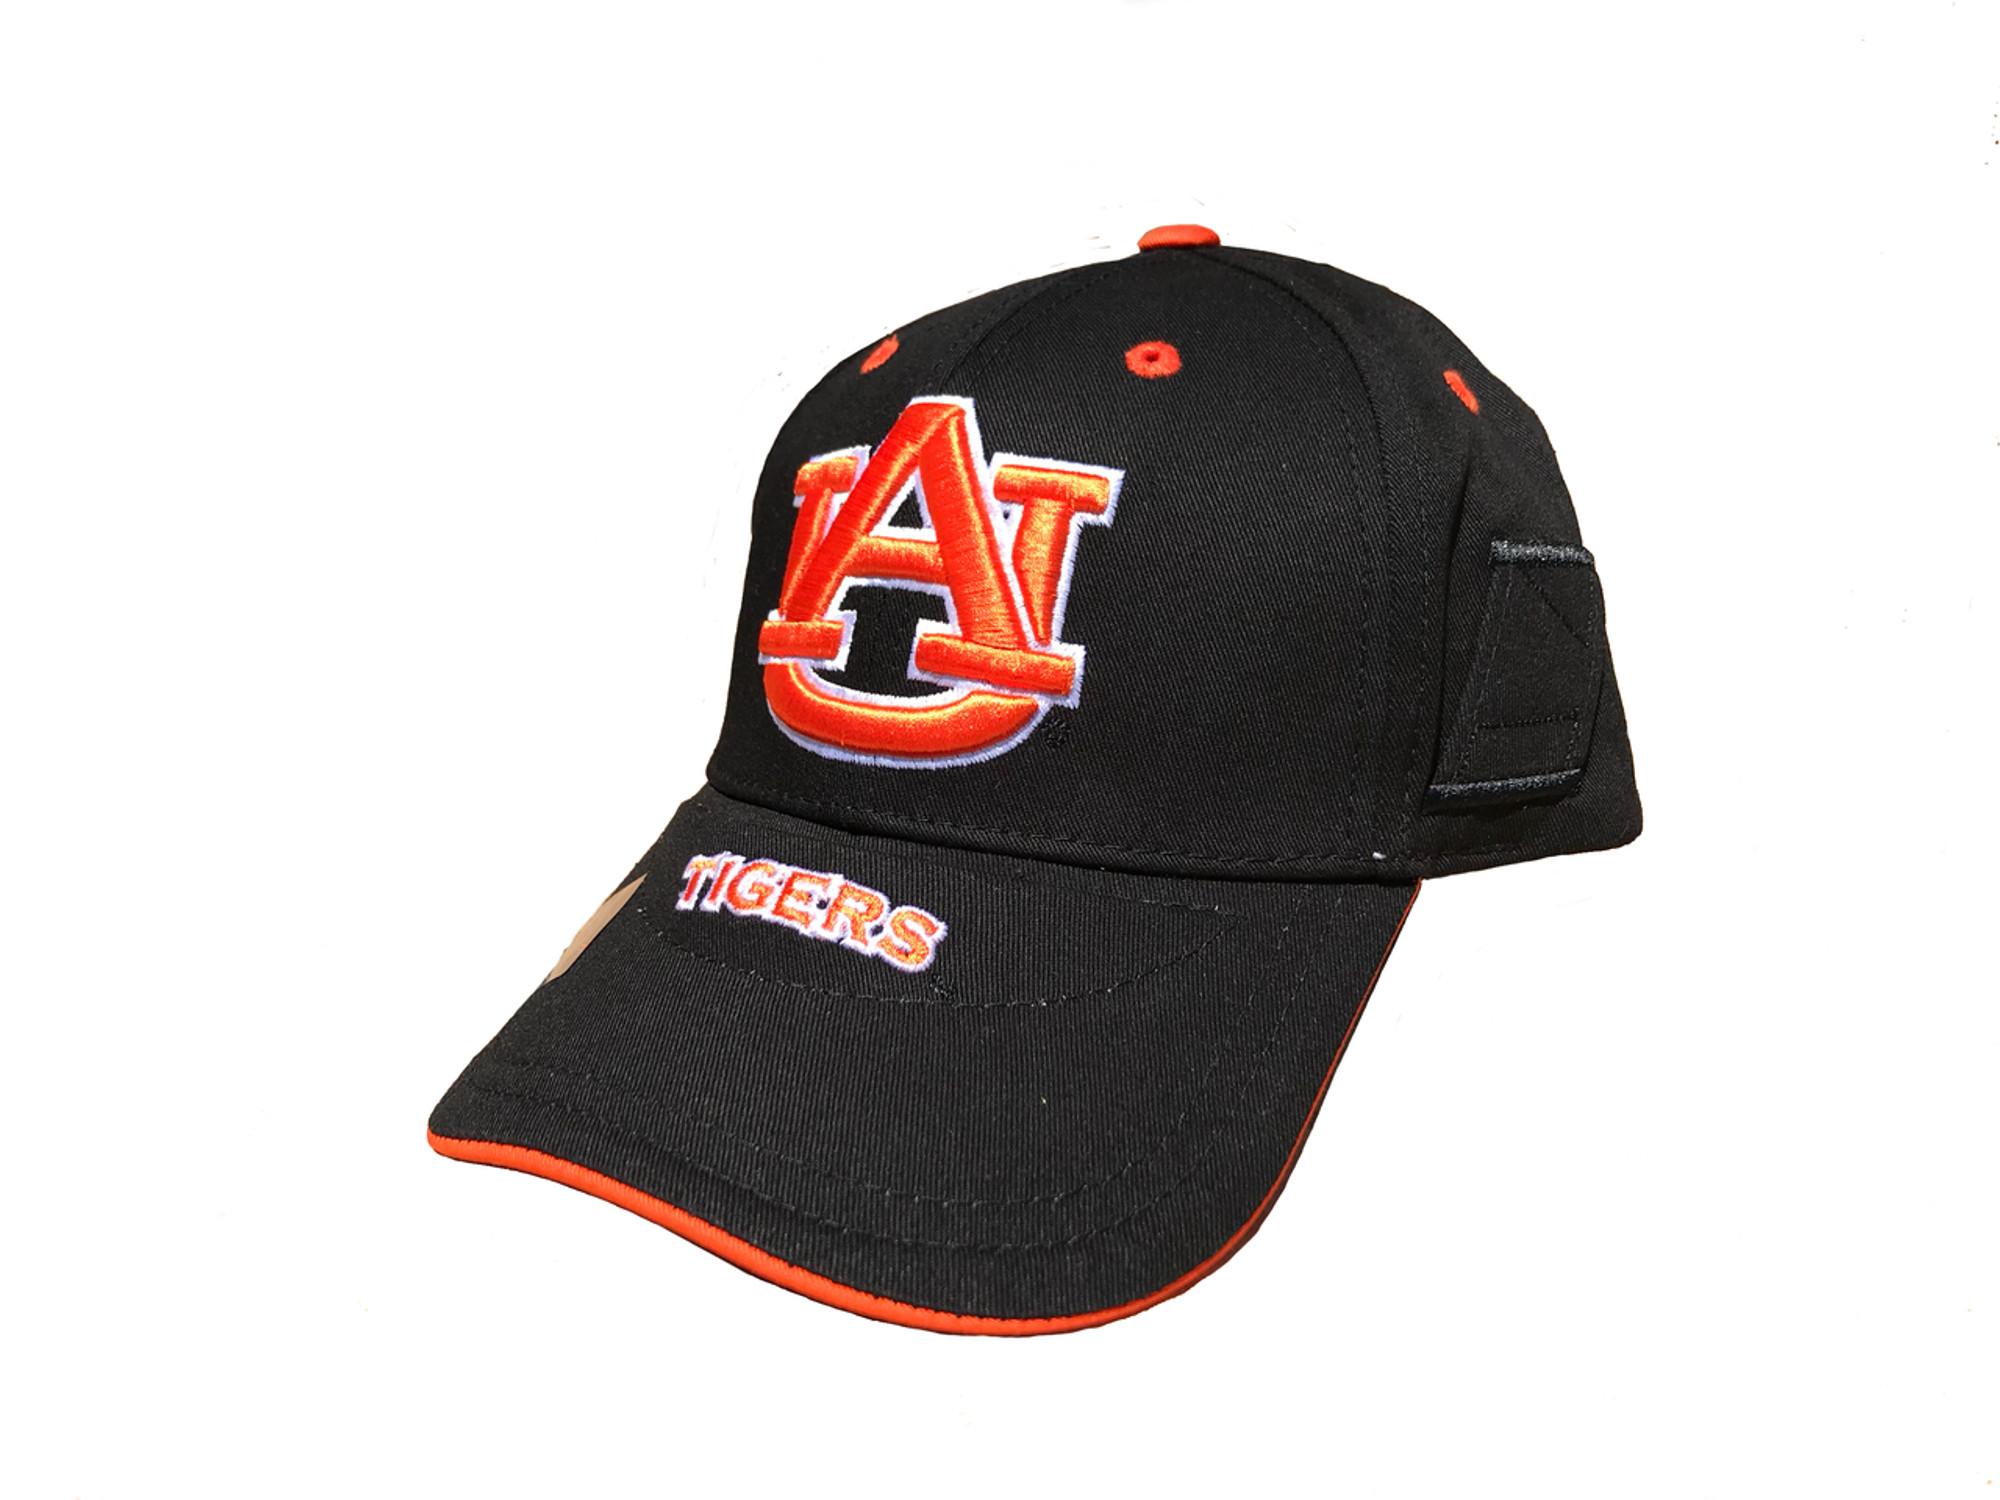 13091668a3dad ... best price auburn tigers hat w sunglasses holder c553f 91ab2